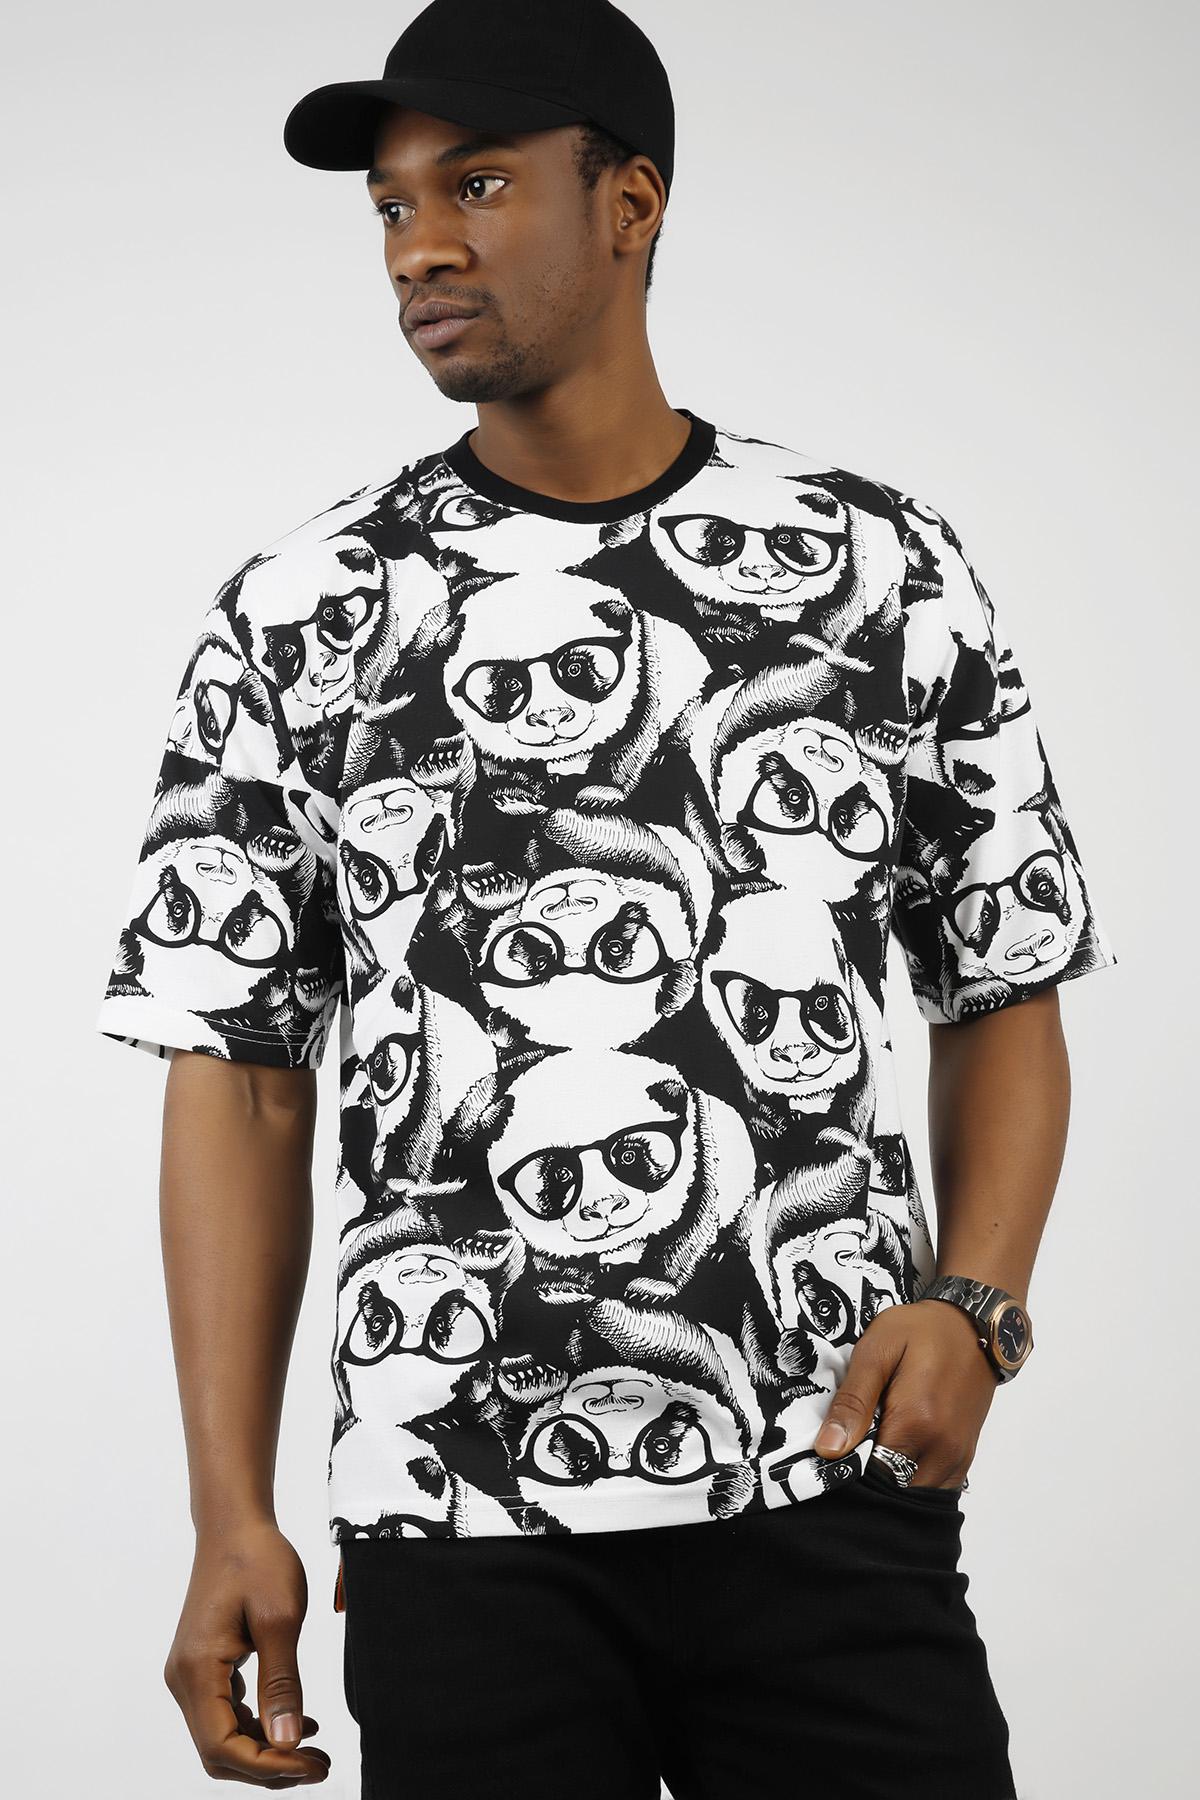 XHAN - Beyaz Panda Desenli Oversize T-Shirt 1KXE1-44728-01